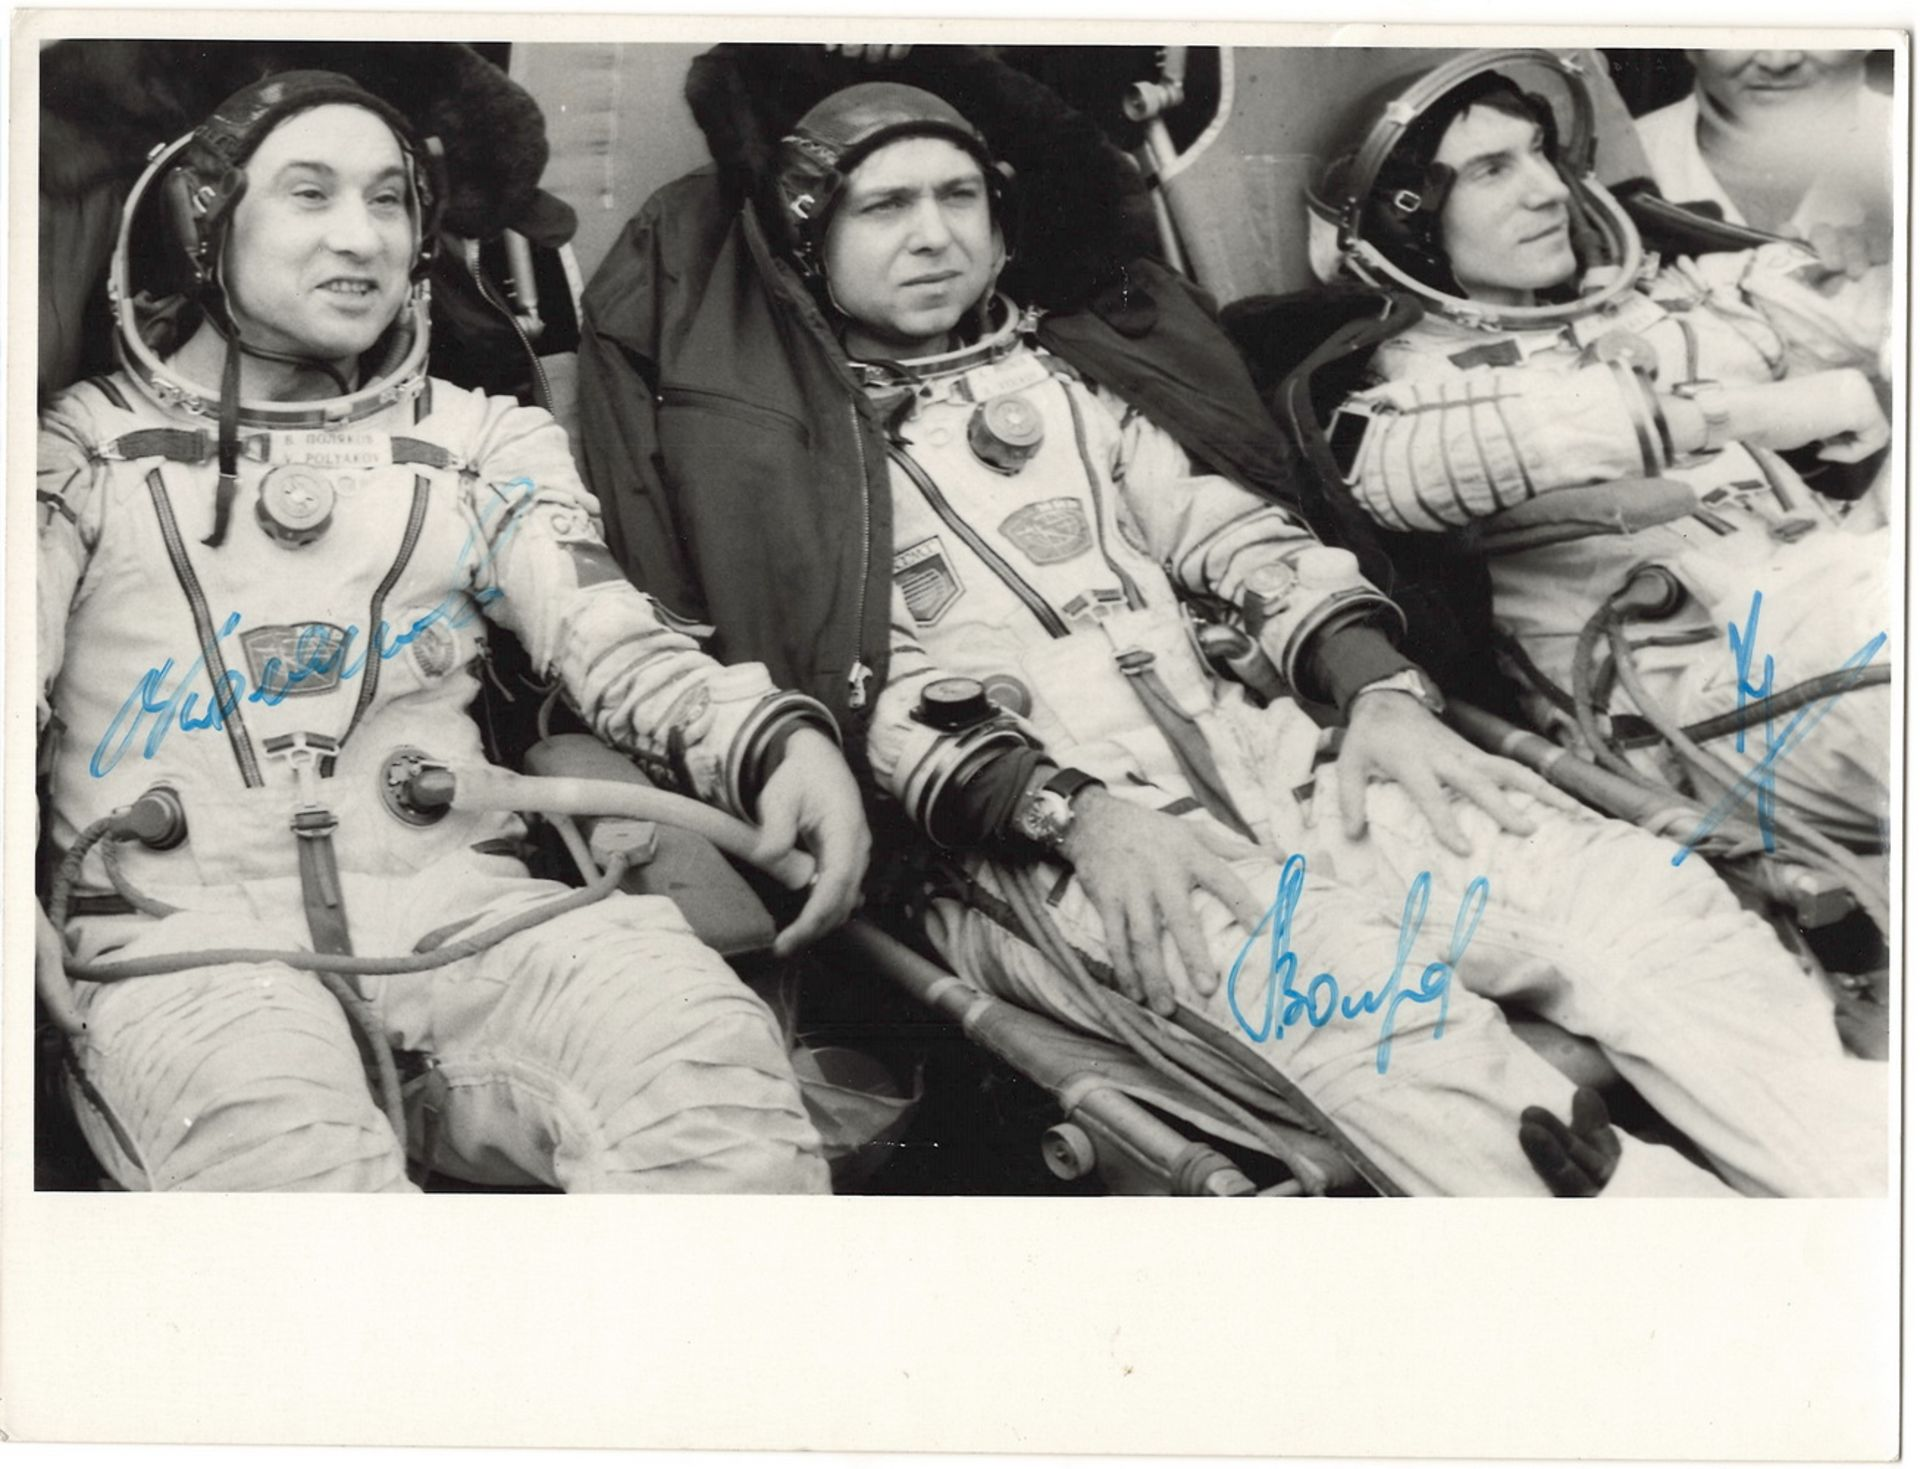 [Soviet cosmonauts, autograph]. Cosmonauts Sergei Krikalev, Aleksandr Volkov and Valery Polyakov. Ph